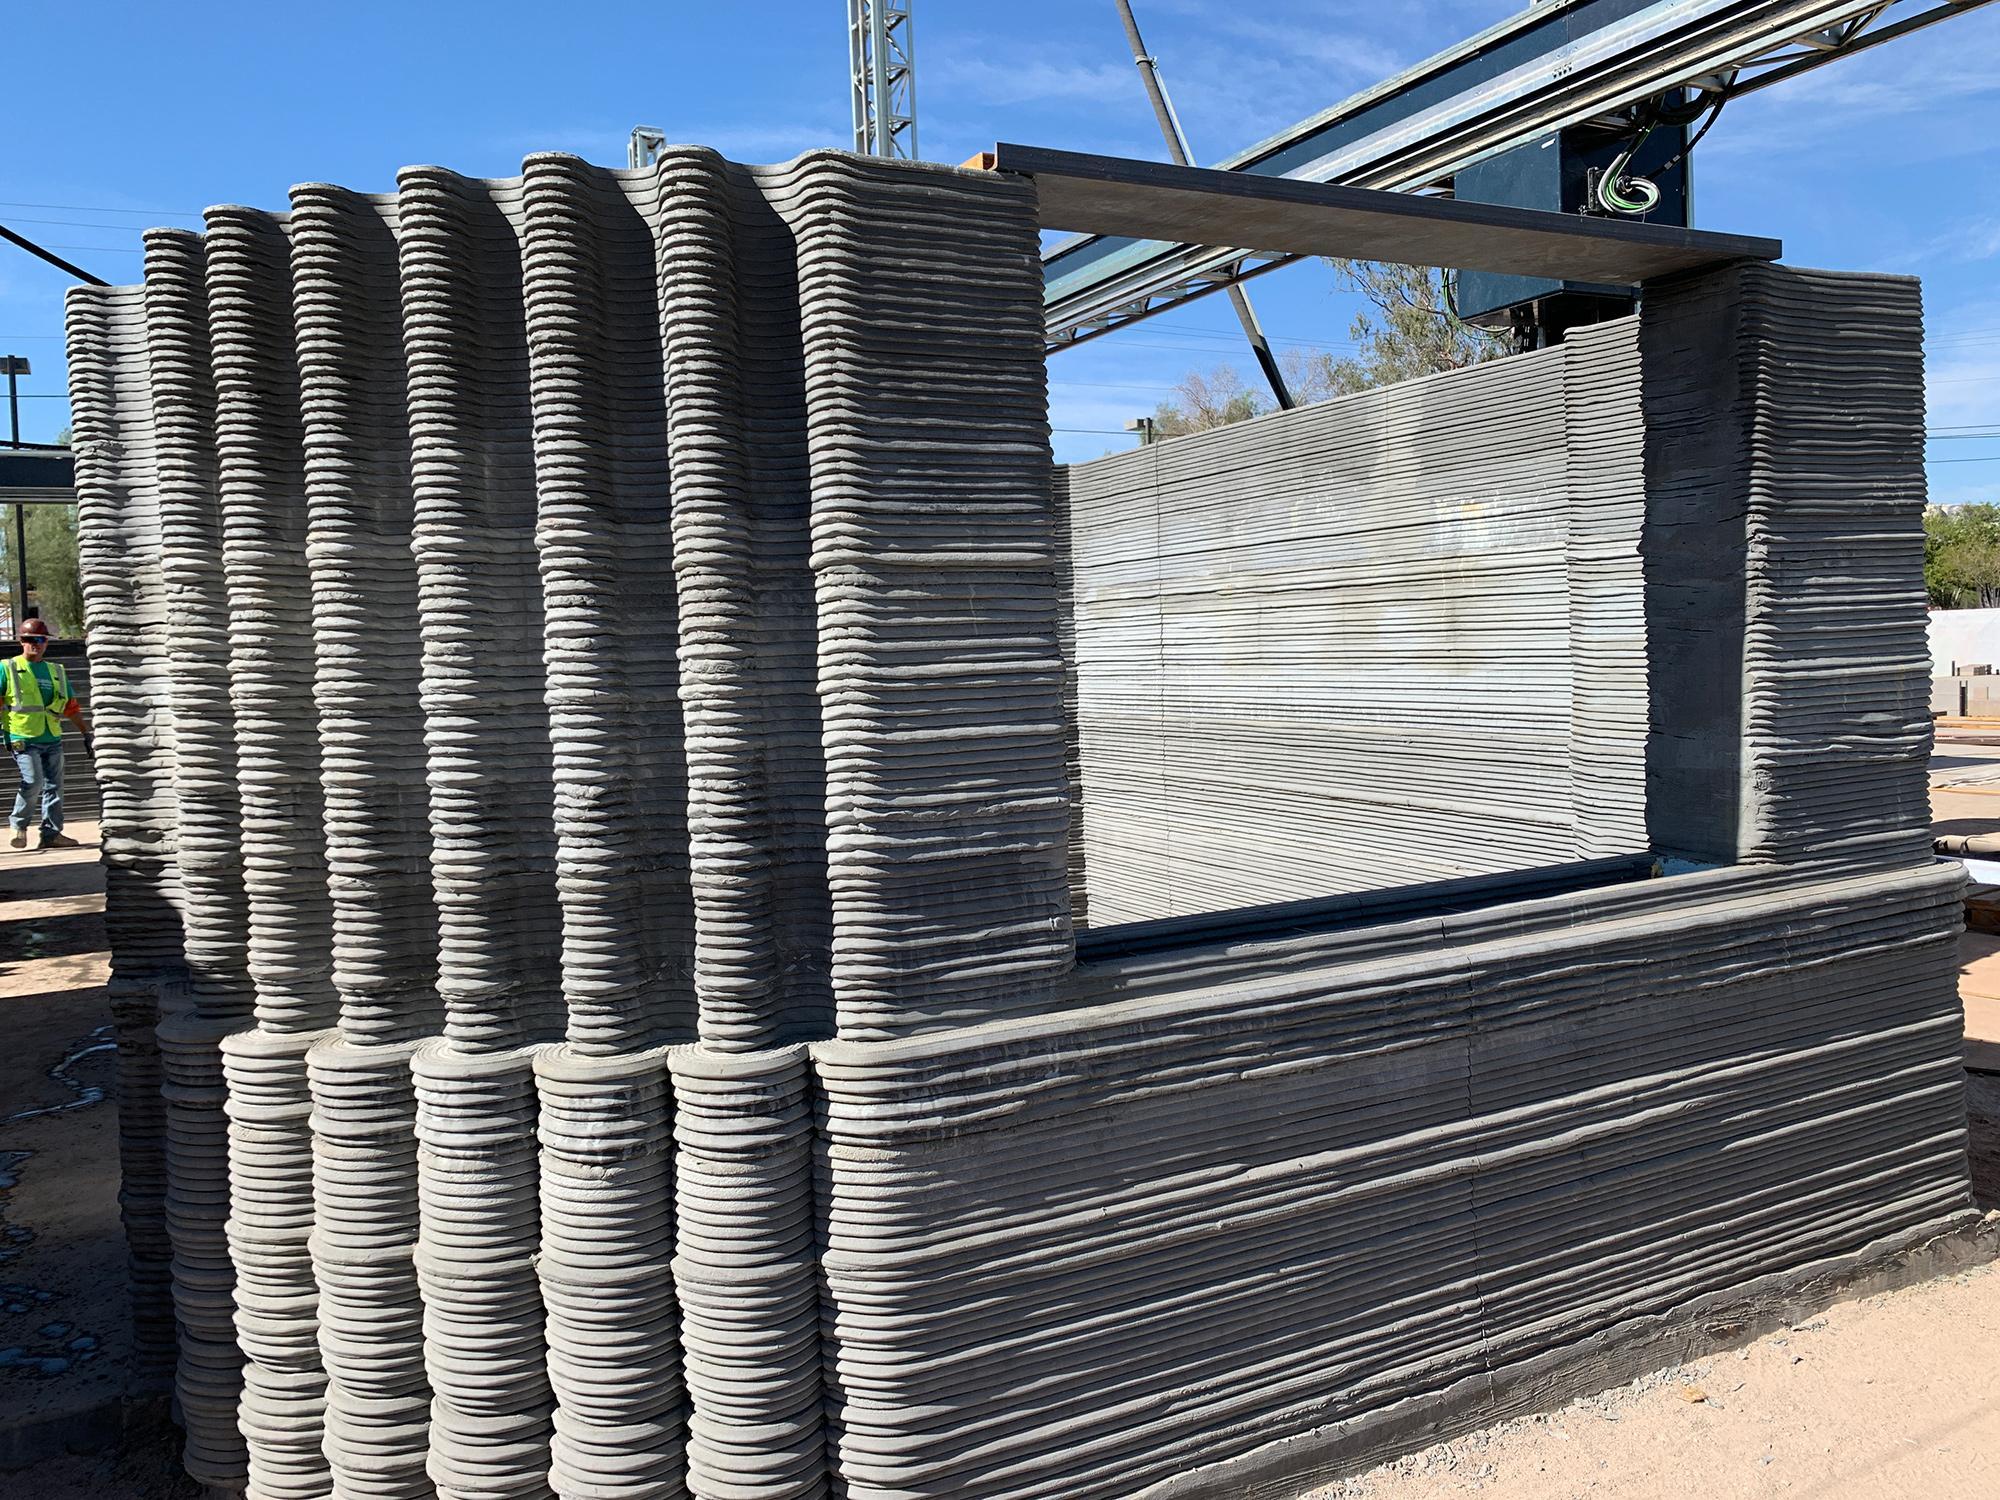 Habitat for Humanity 3D-printed house Tempe Arizona